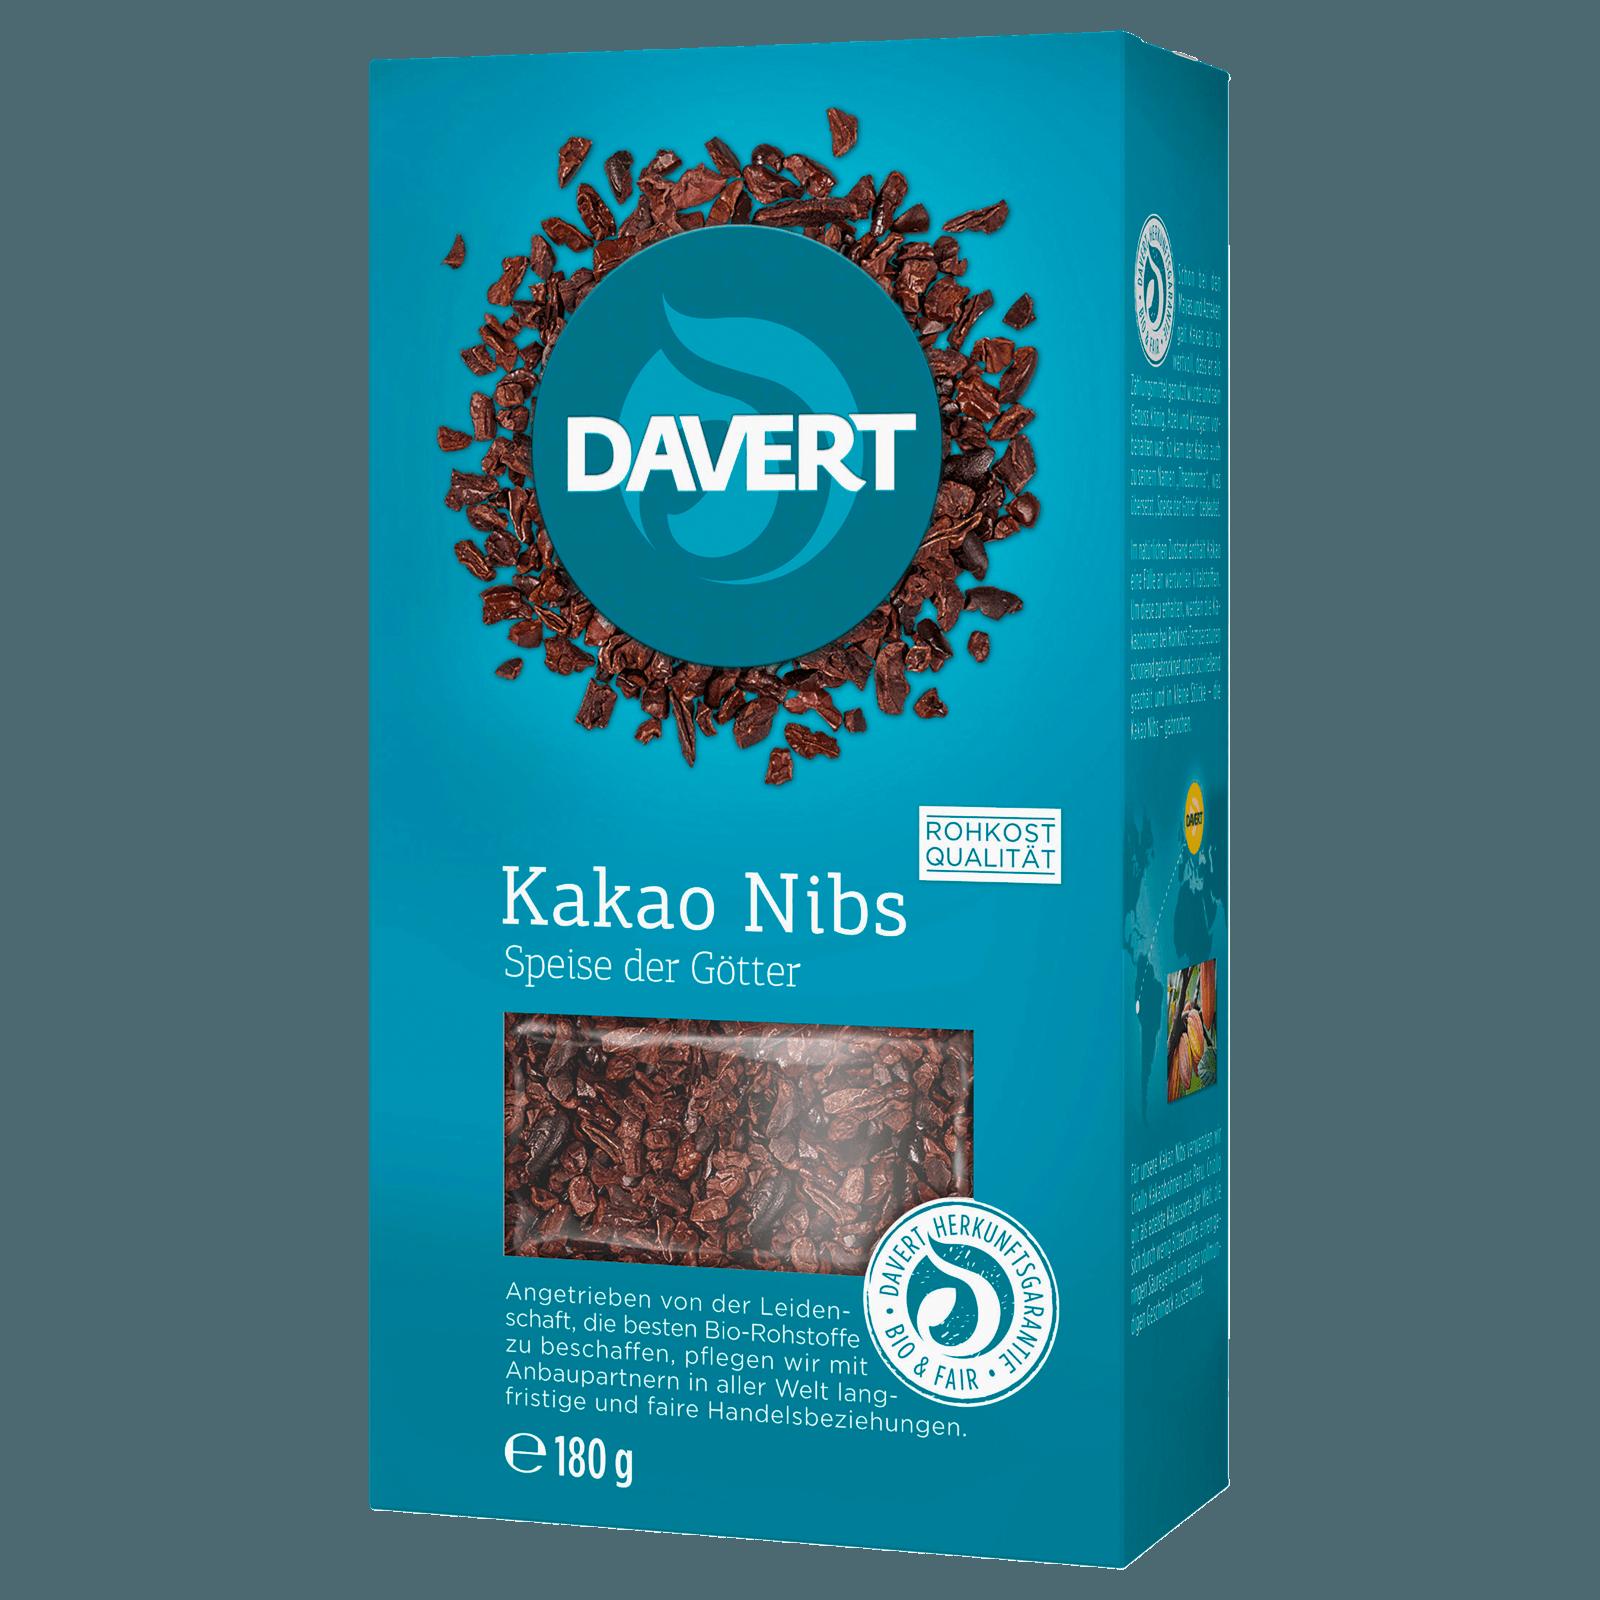 Davert Kakao Nibs 180g